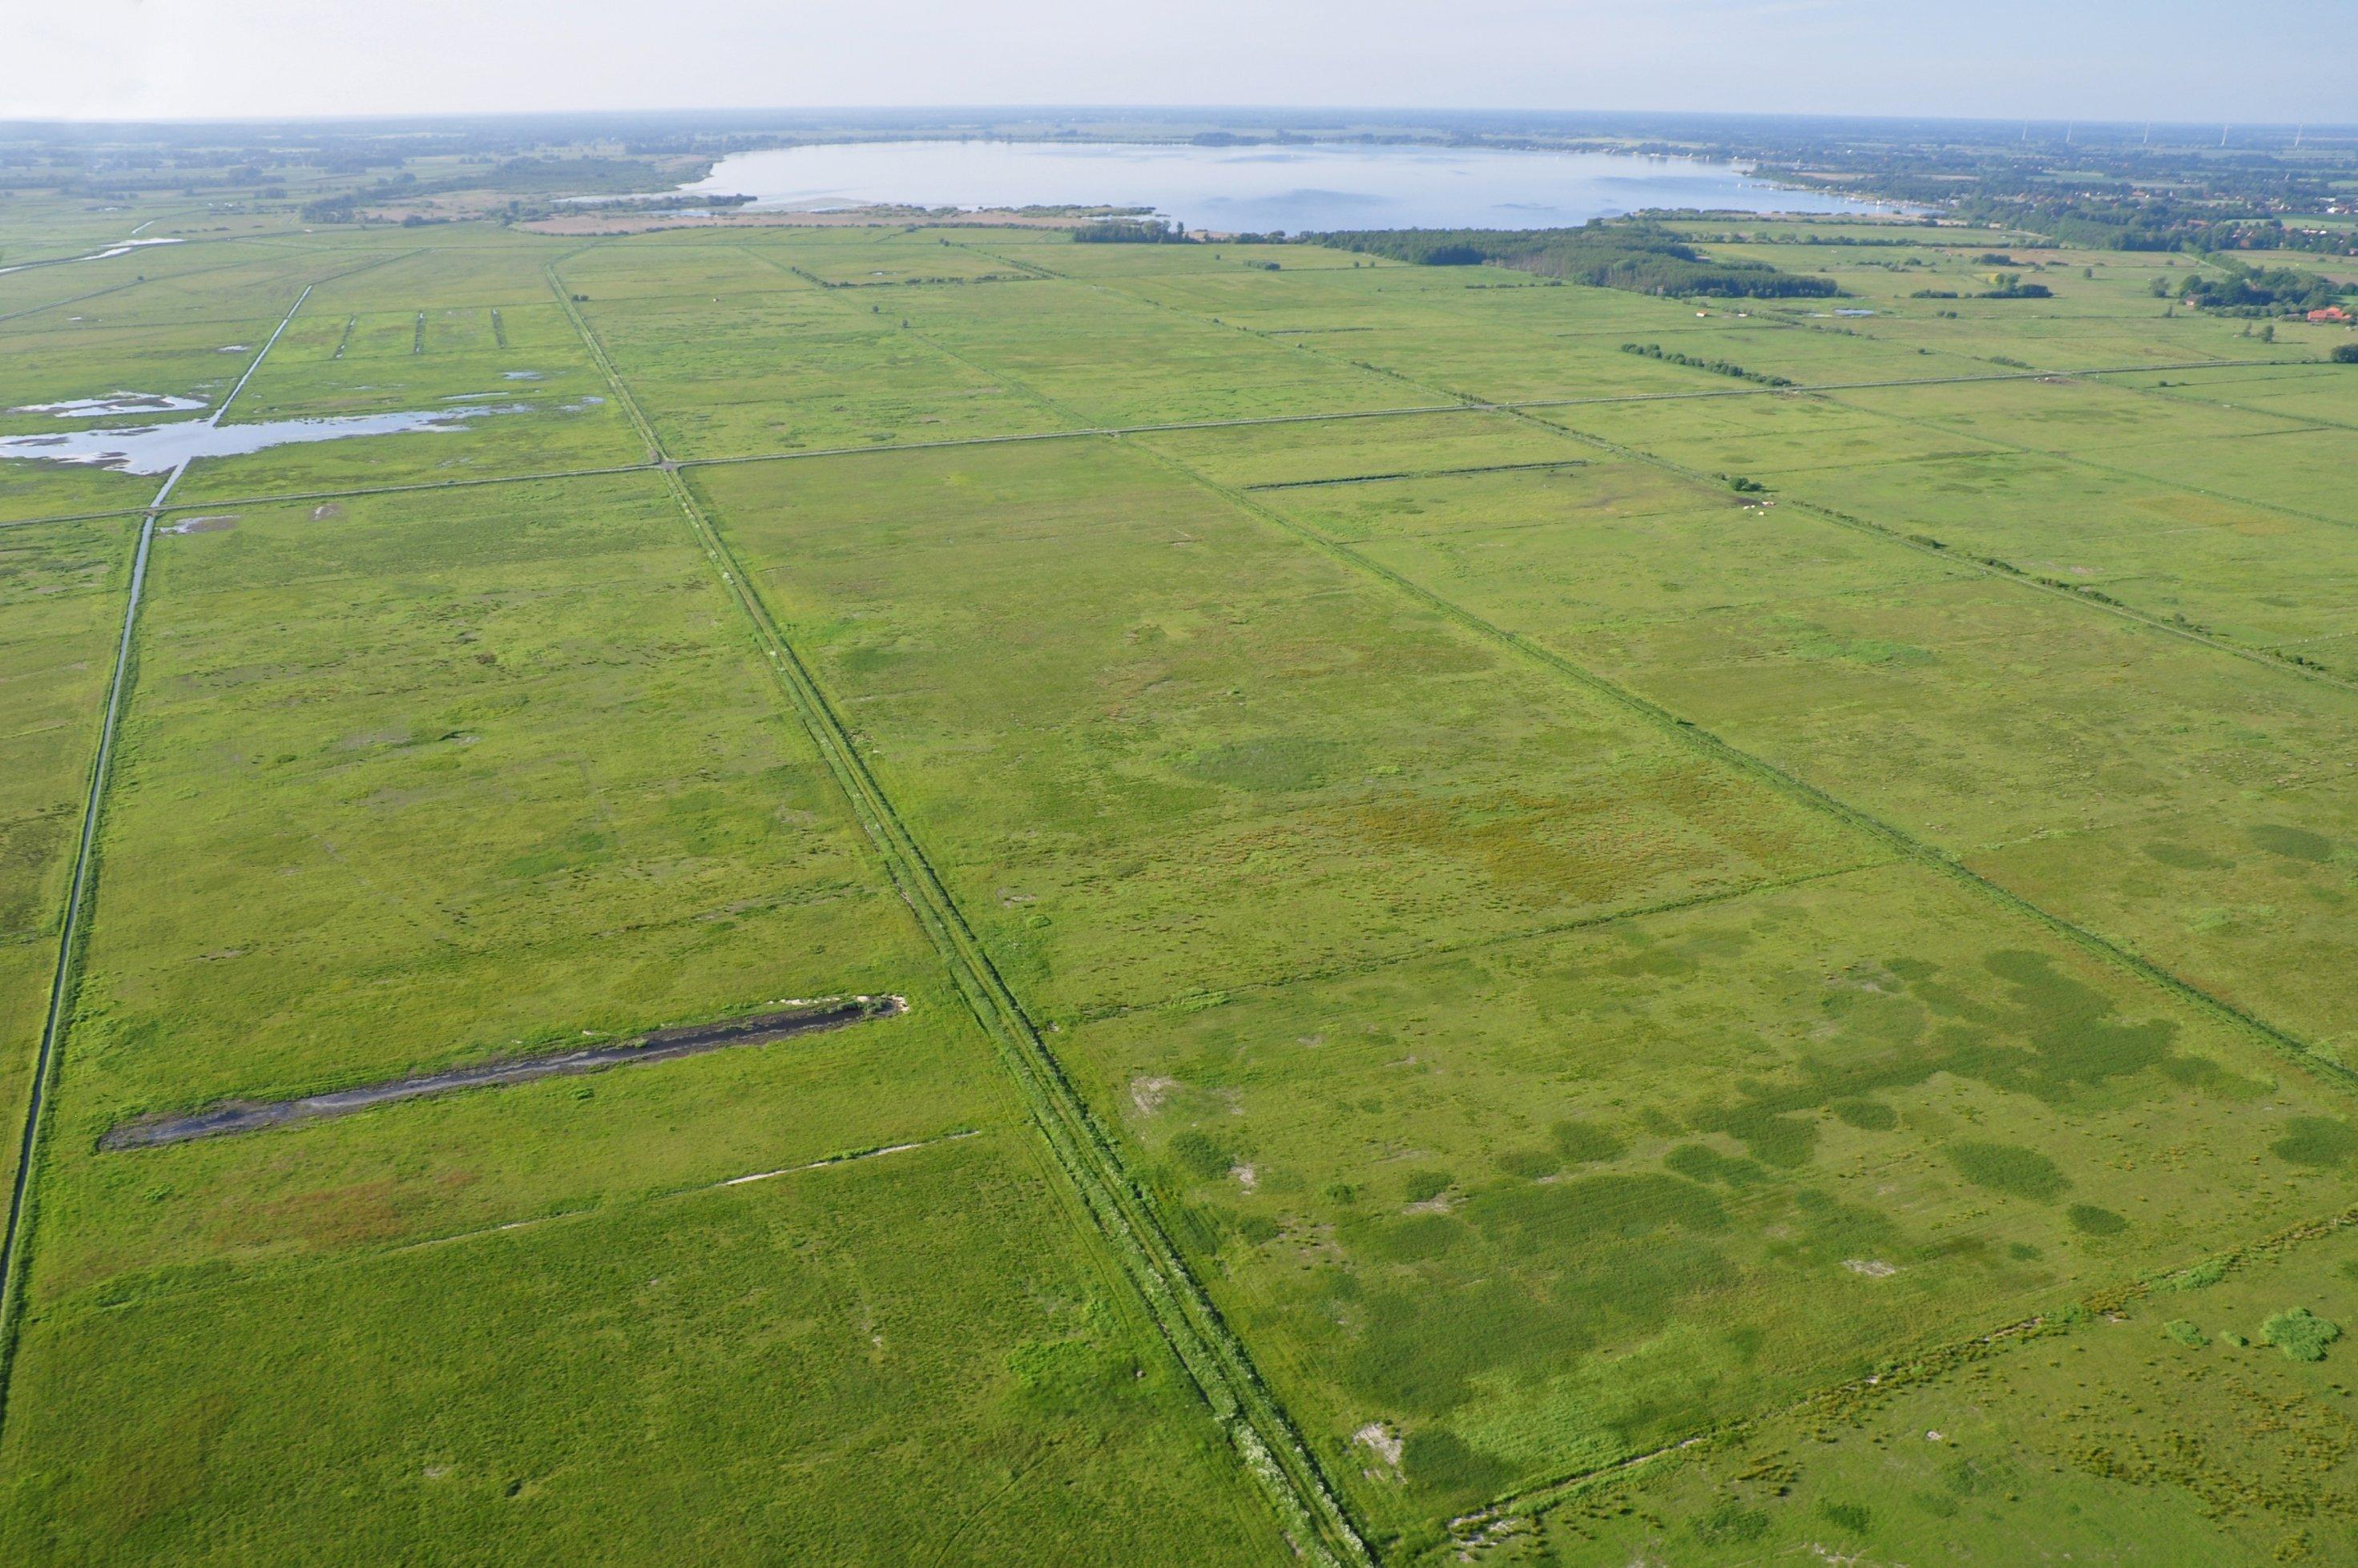 Luftaufnahme des Ochsenmoors.